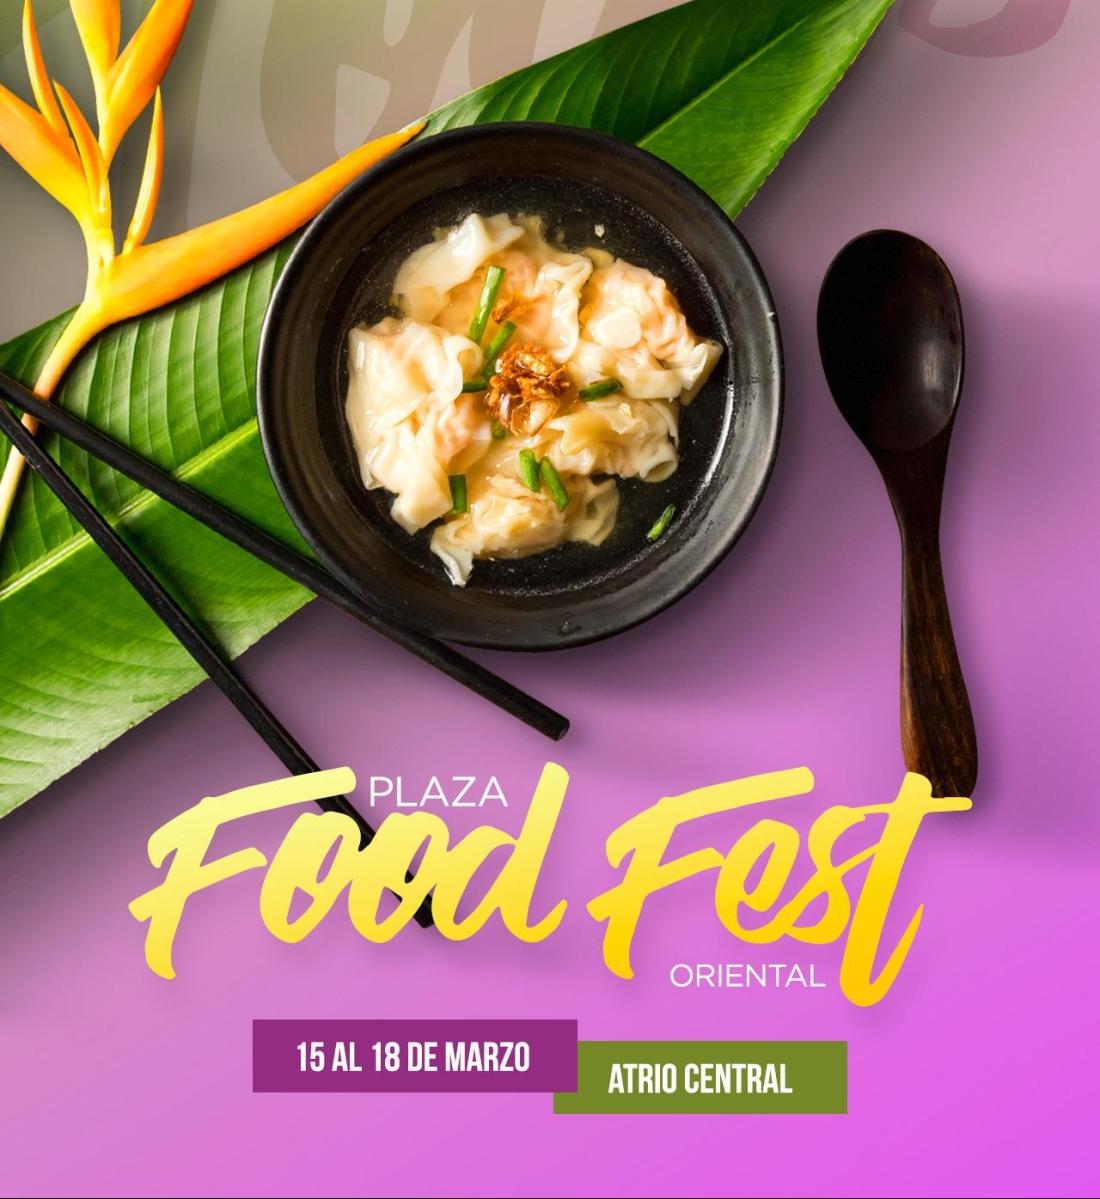 Transporta tu paladar al oriente con PLAZA Food Fest 2018 Oriental